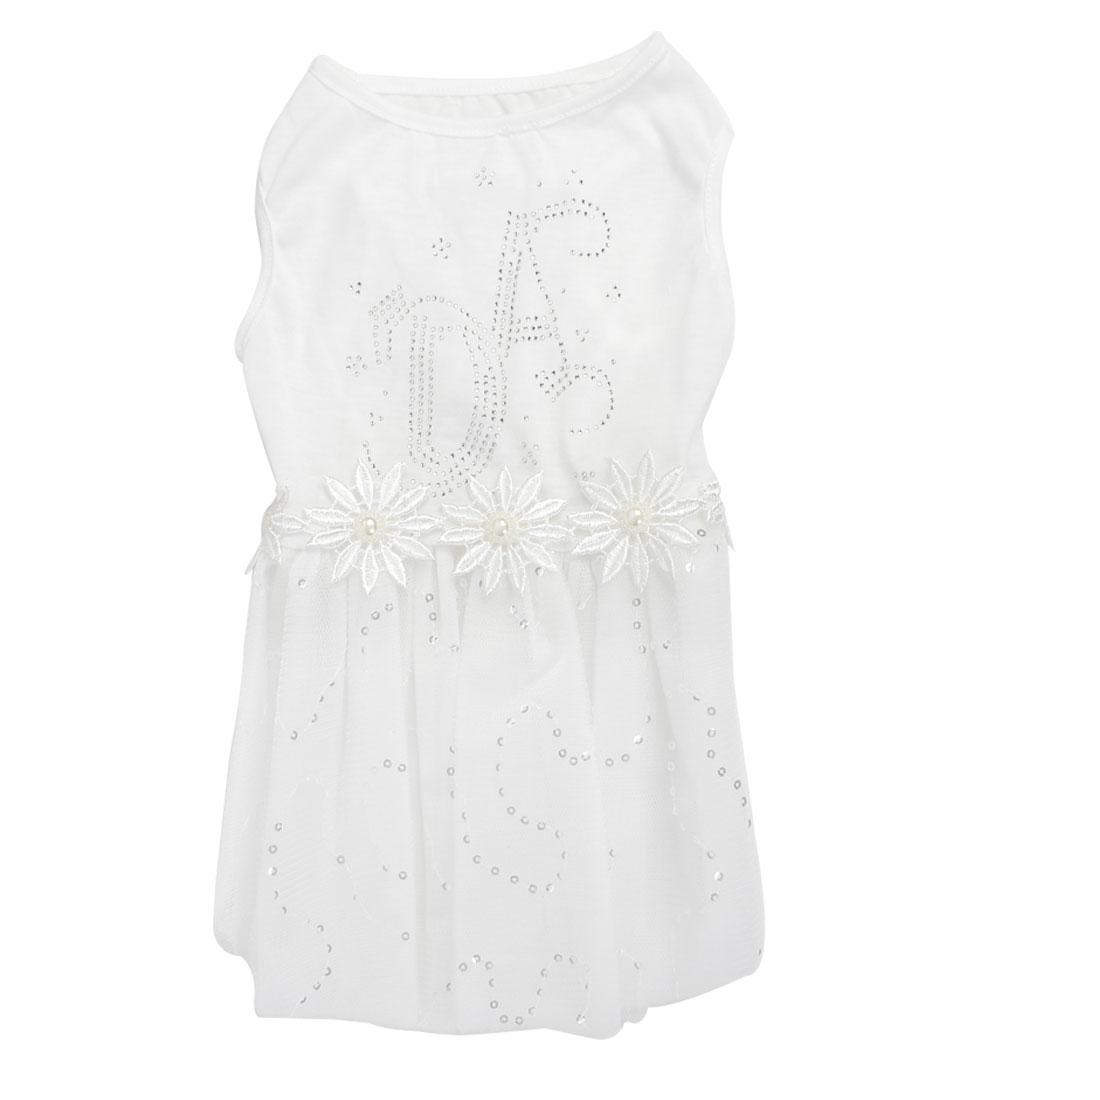 Pet Dog Doggie Flowers Decor Sleeveless Wedding Dress Skirt White Size S